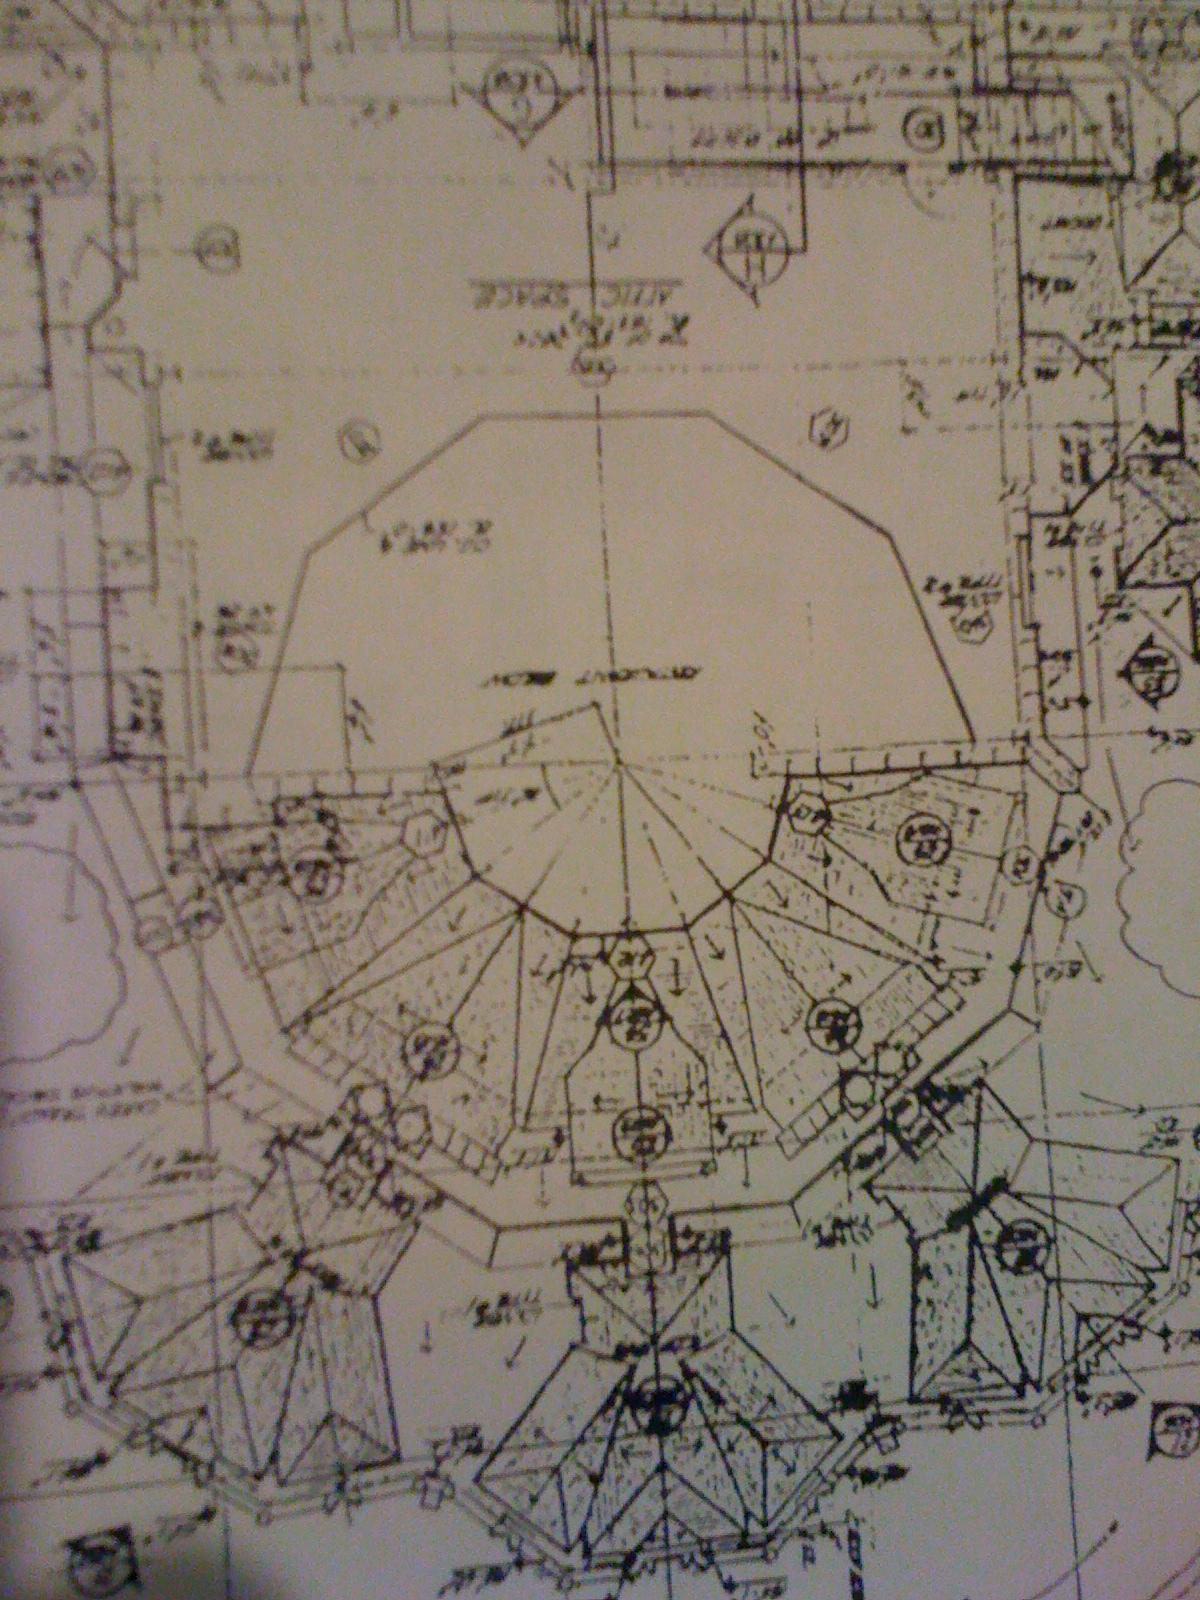 Walt Disney World Fantasyland Blueprints